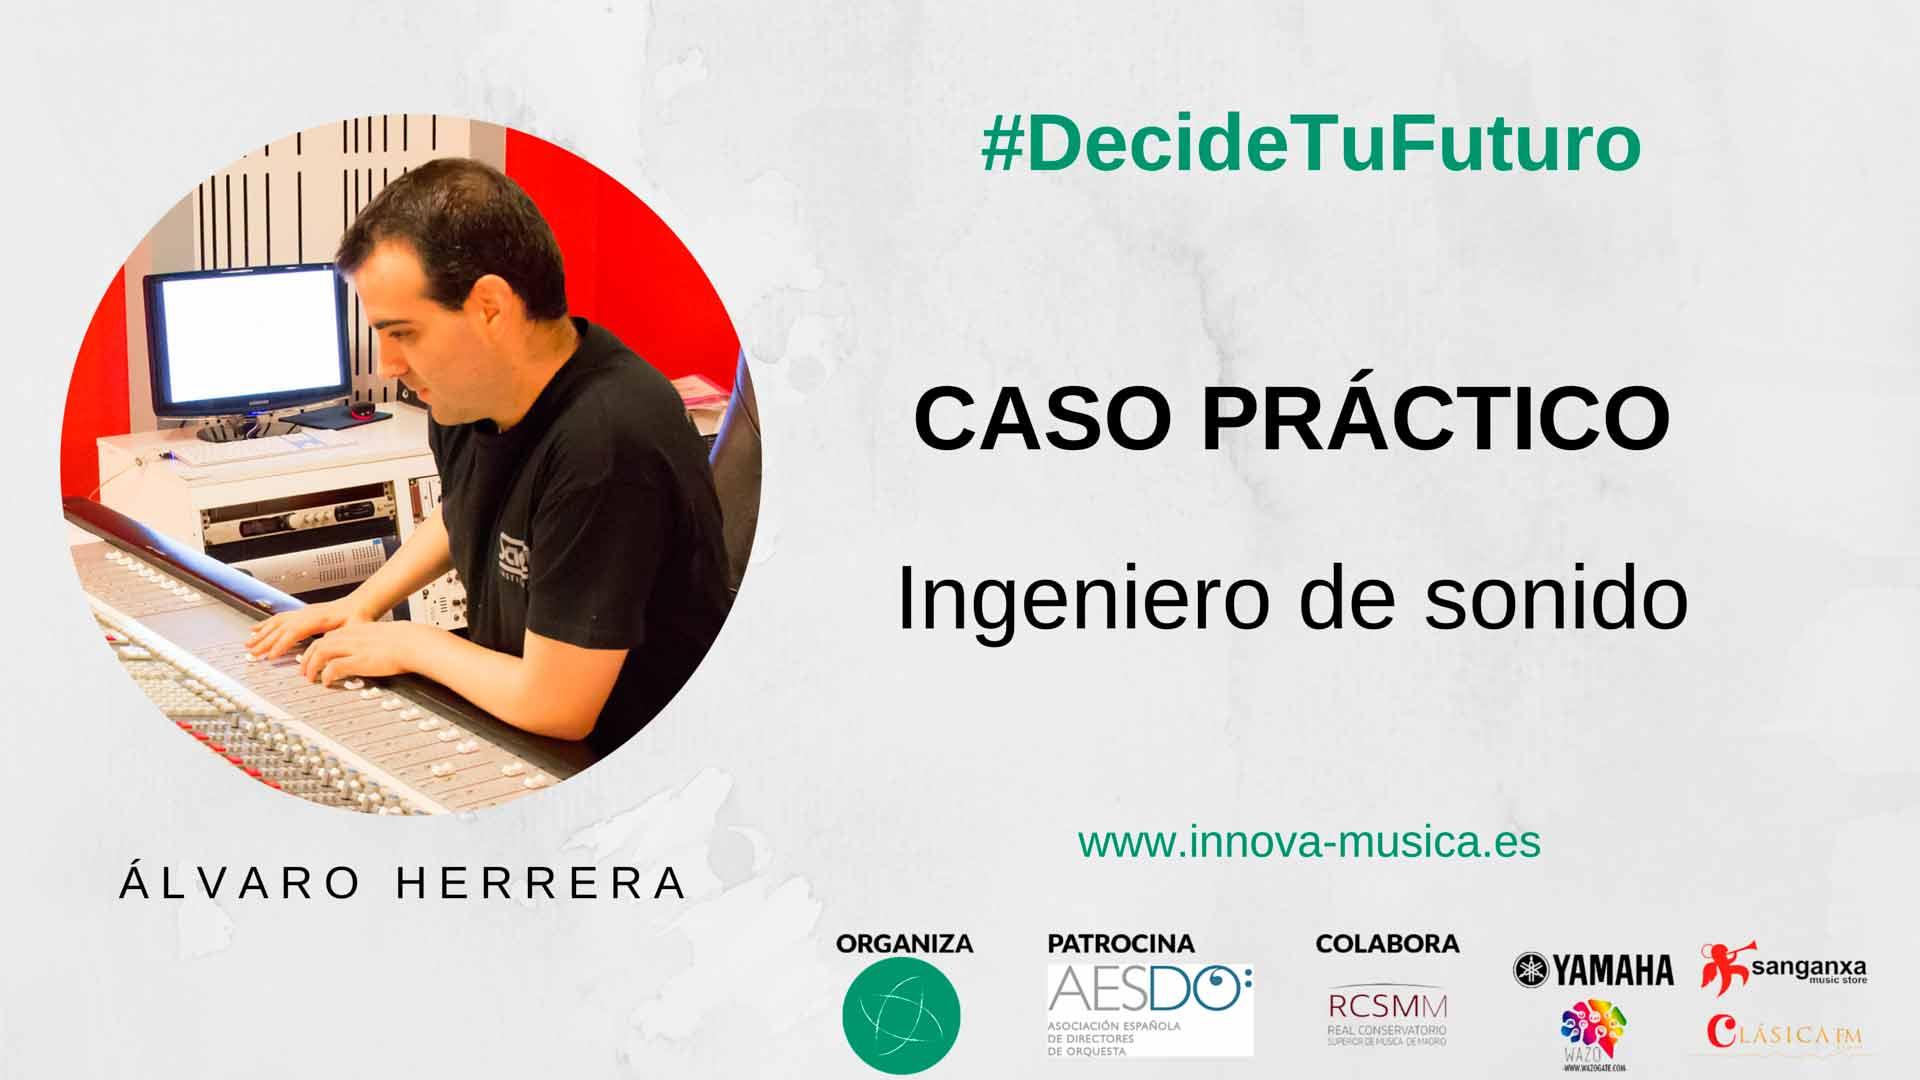 Álvaro-Herrera-Caso-Práctico-Ingeniero-de-Sonido